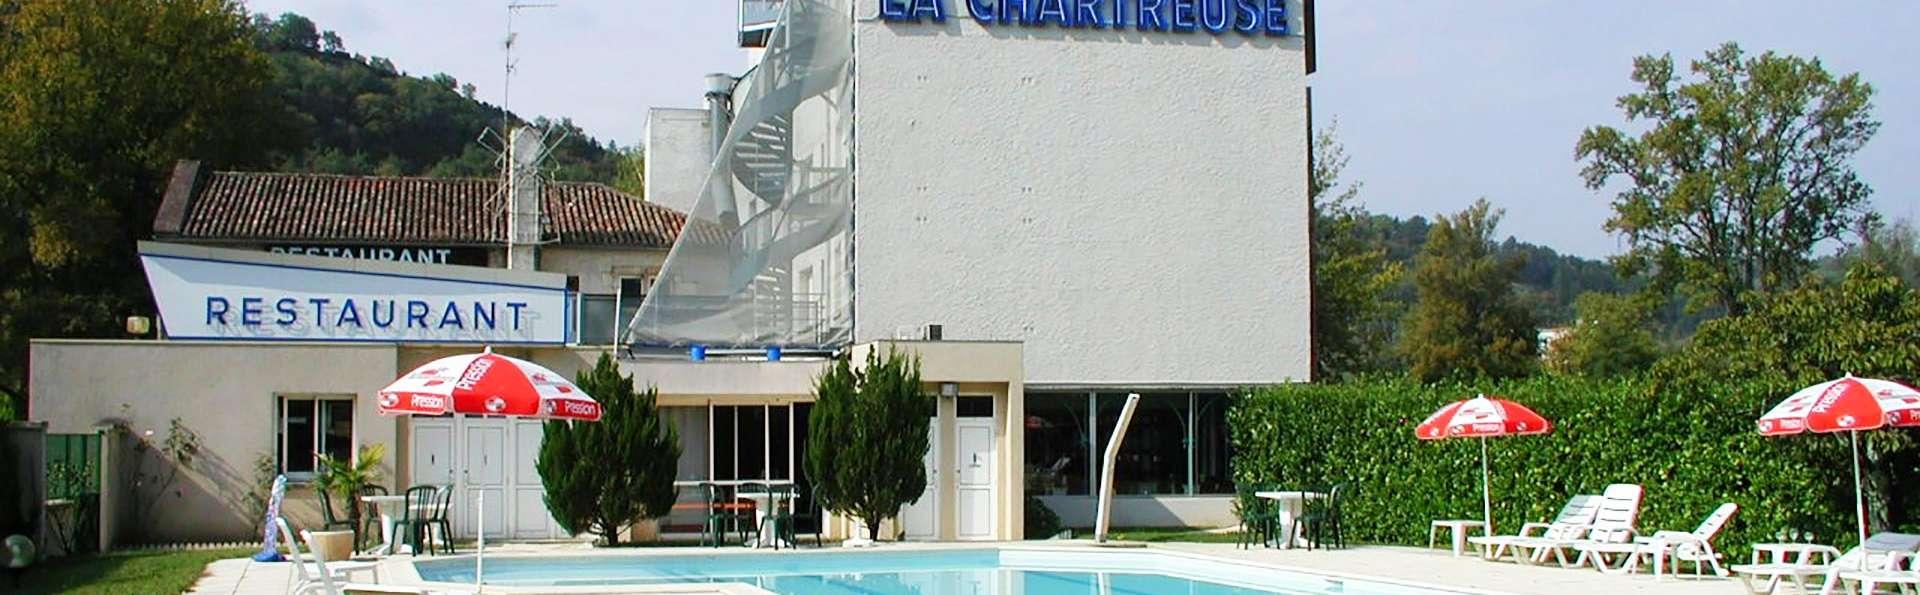 La Chartreuse - EDIT_frontpool.jpg